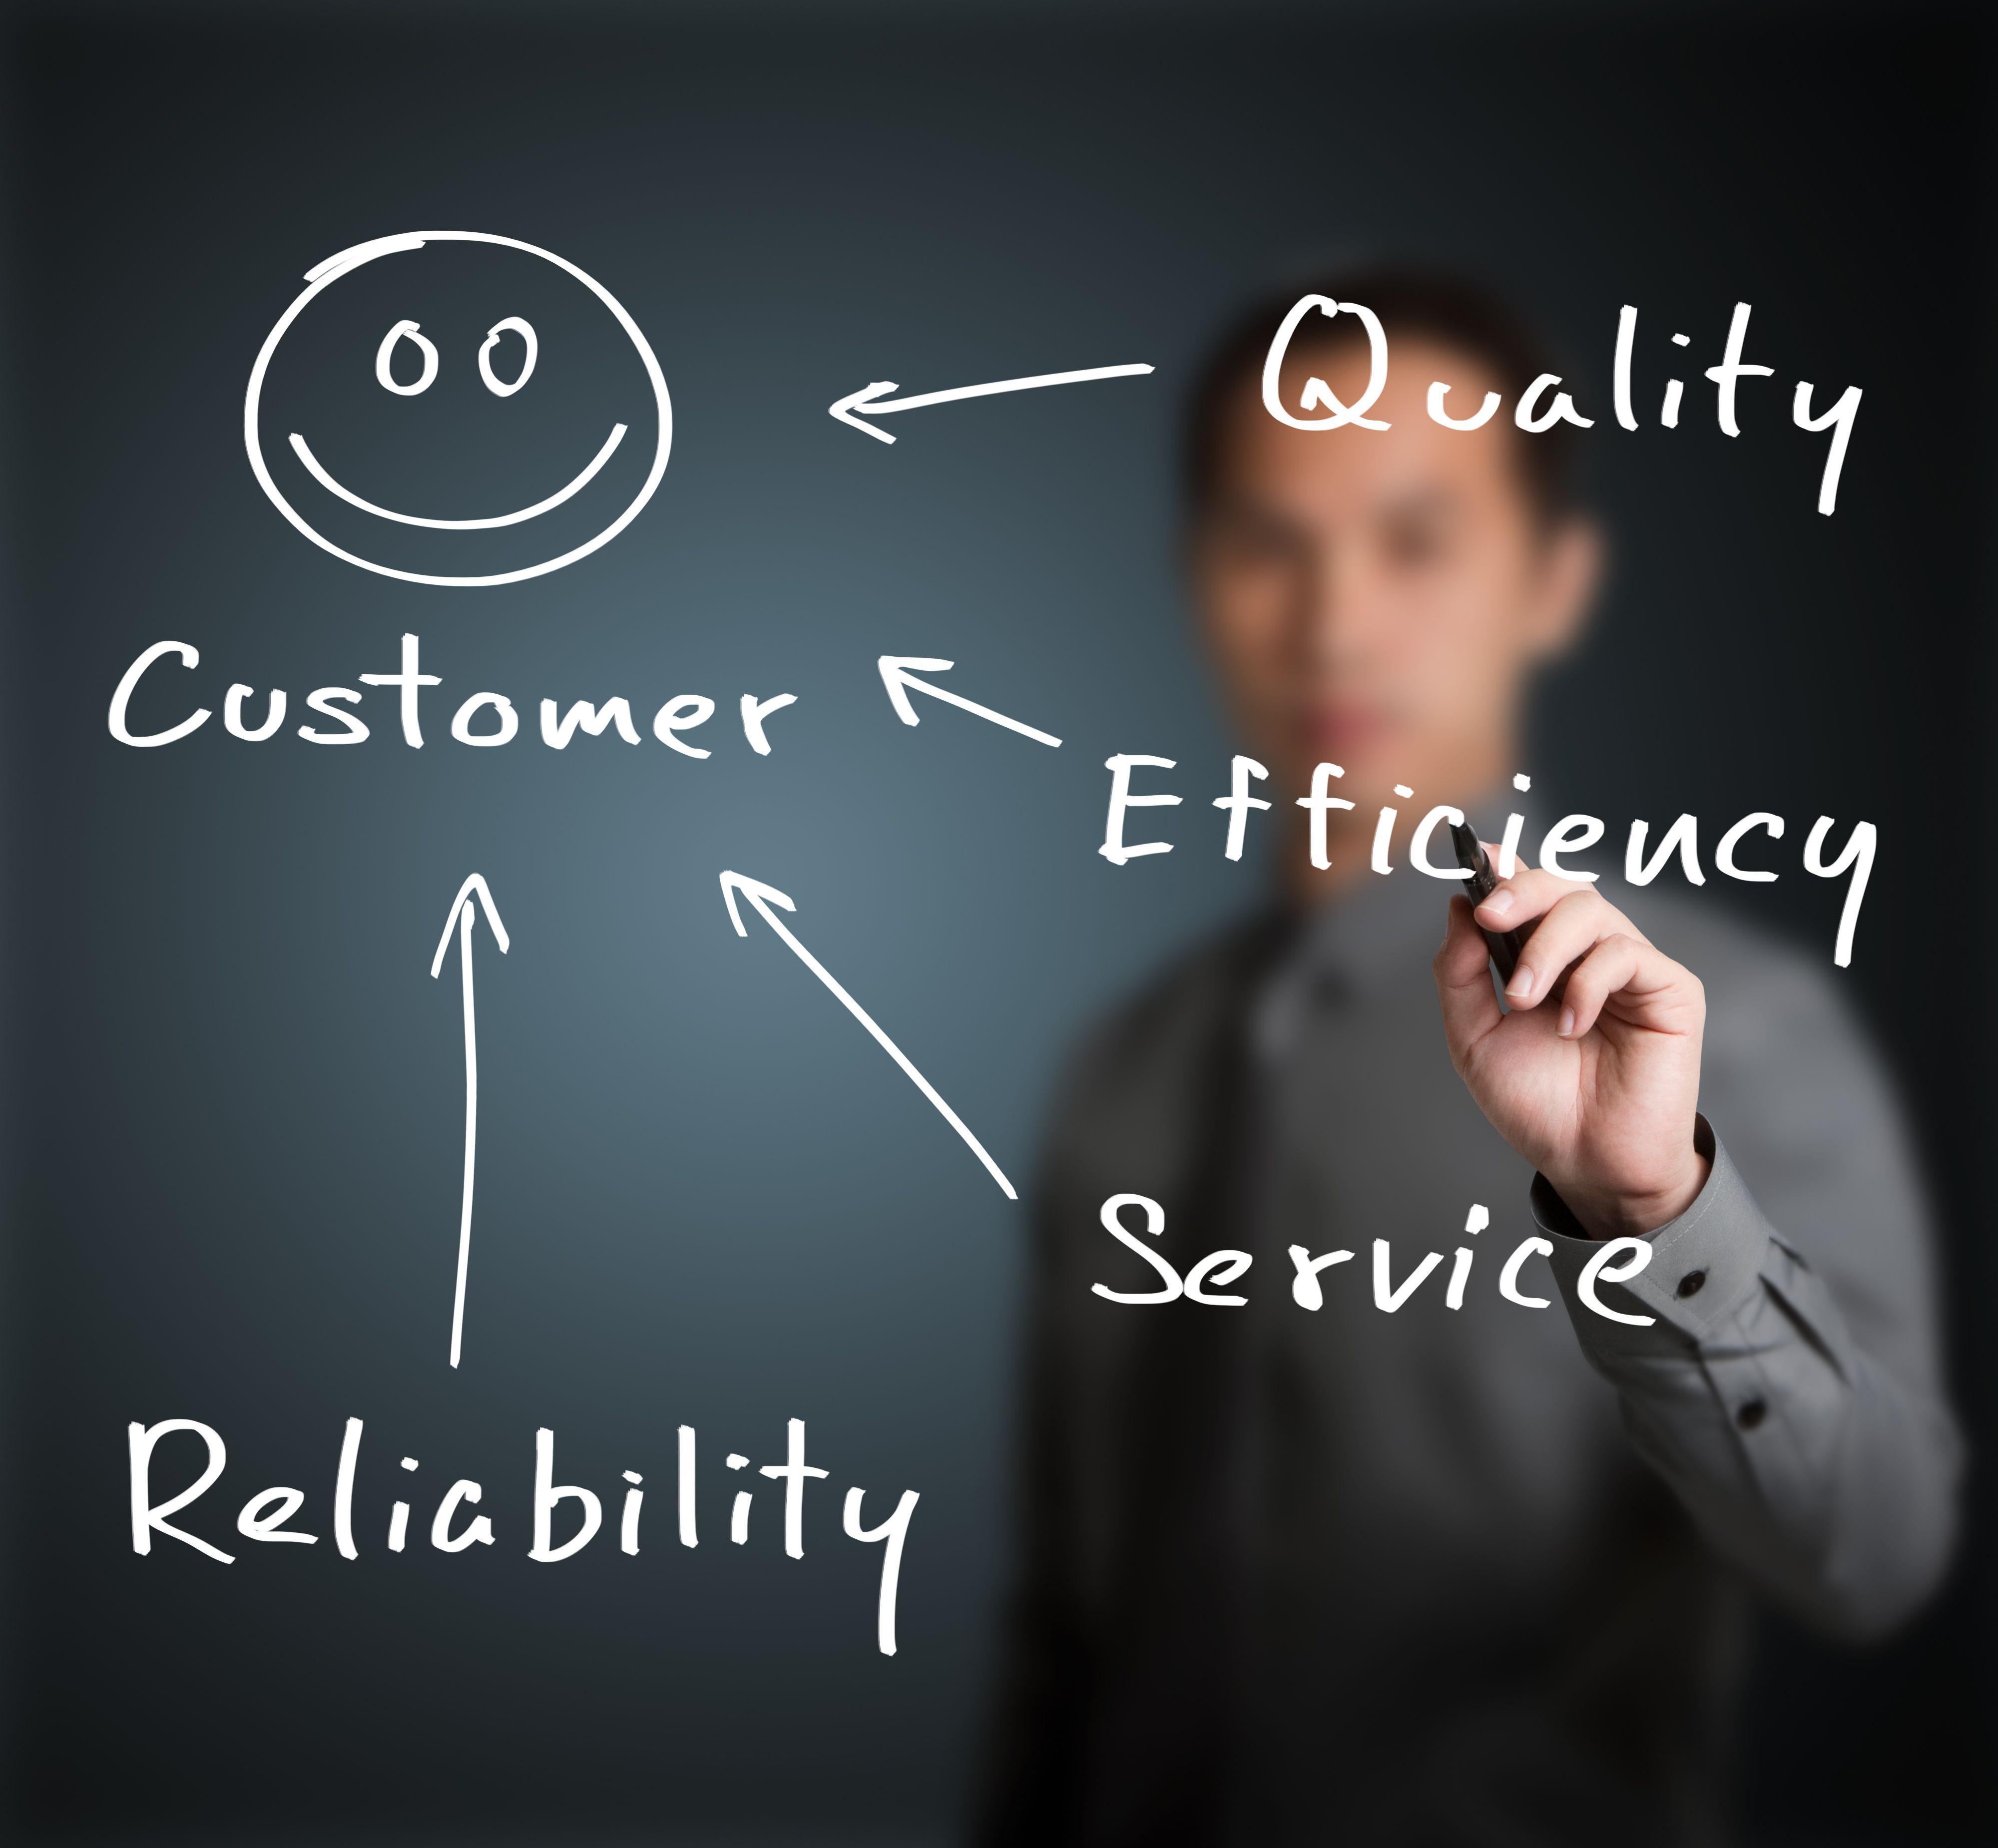 Customer Centric Companies